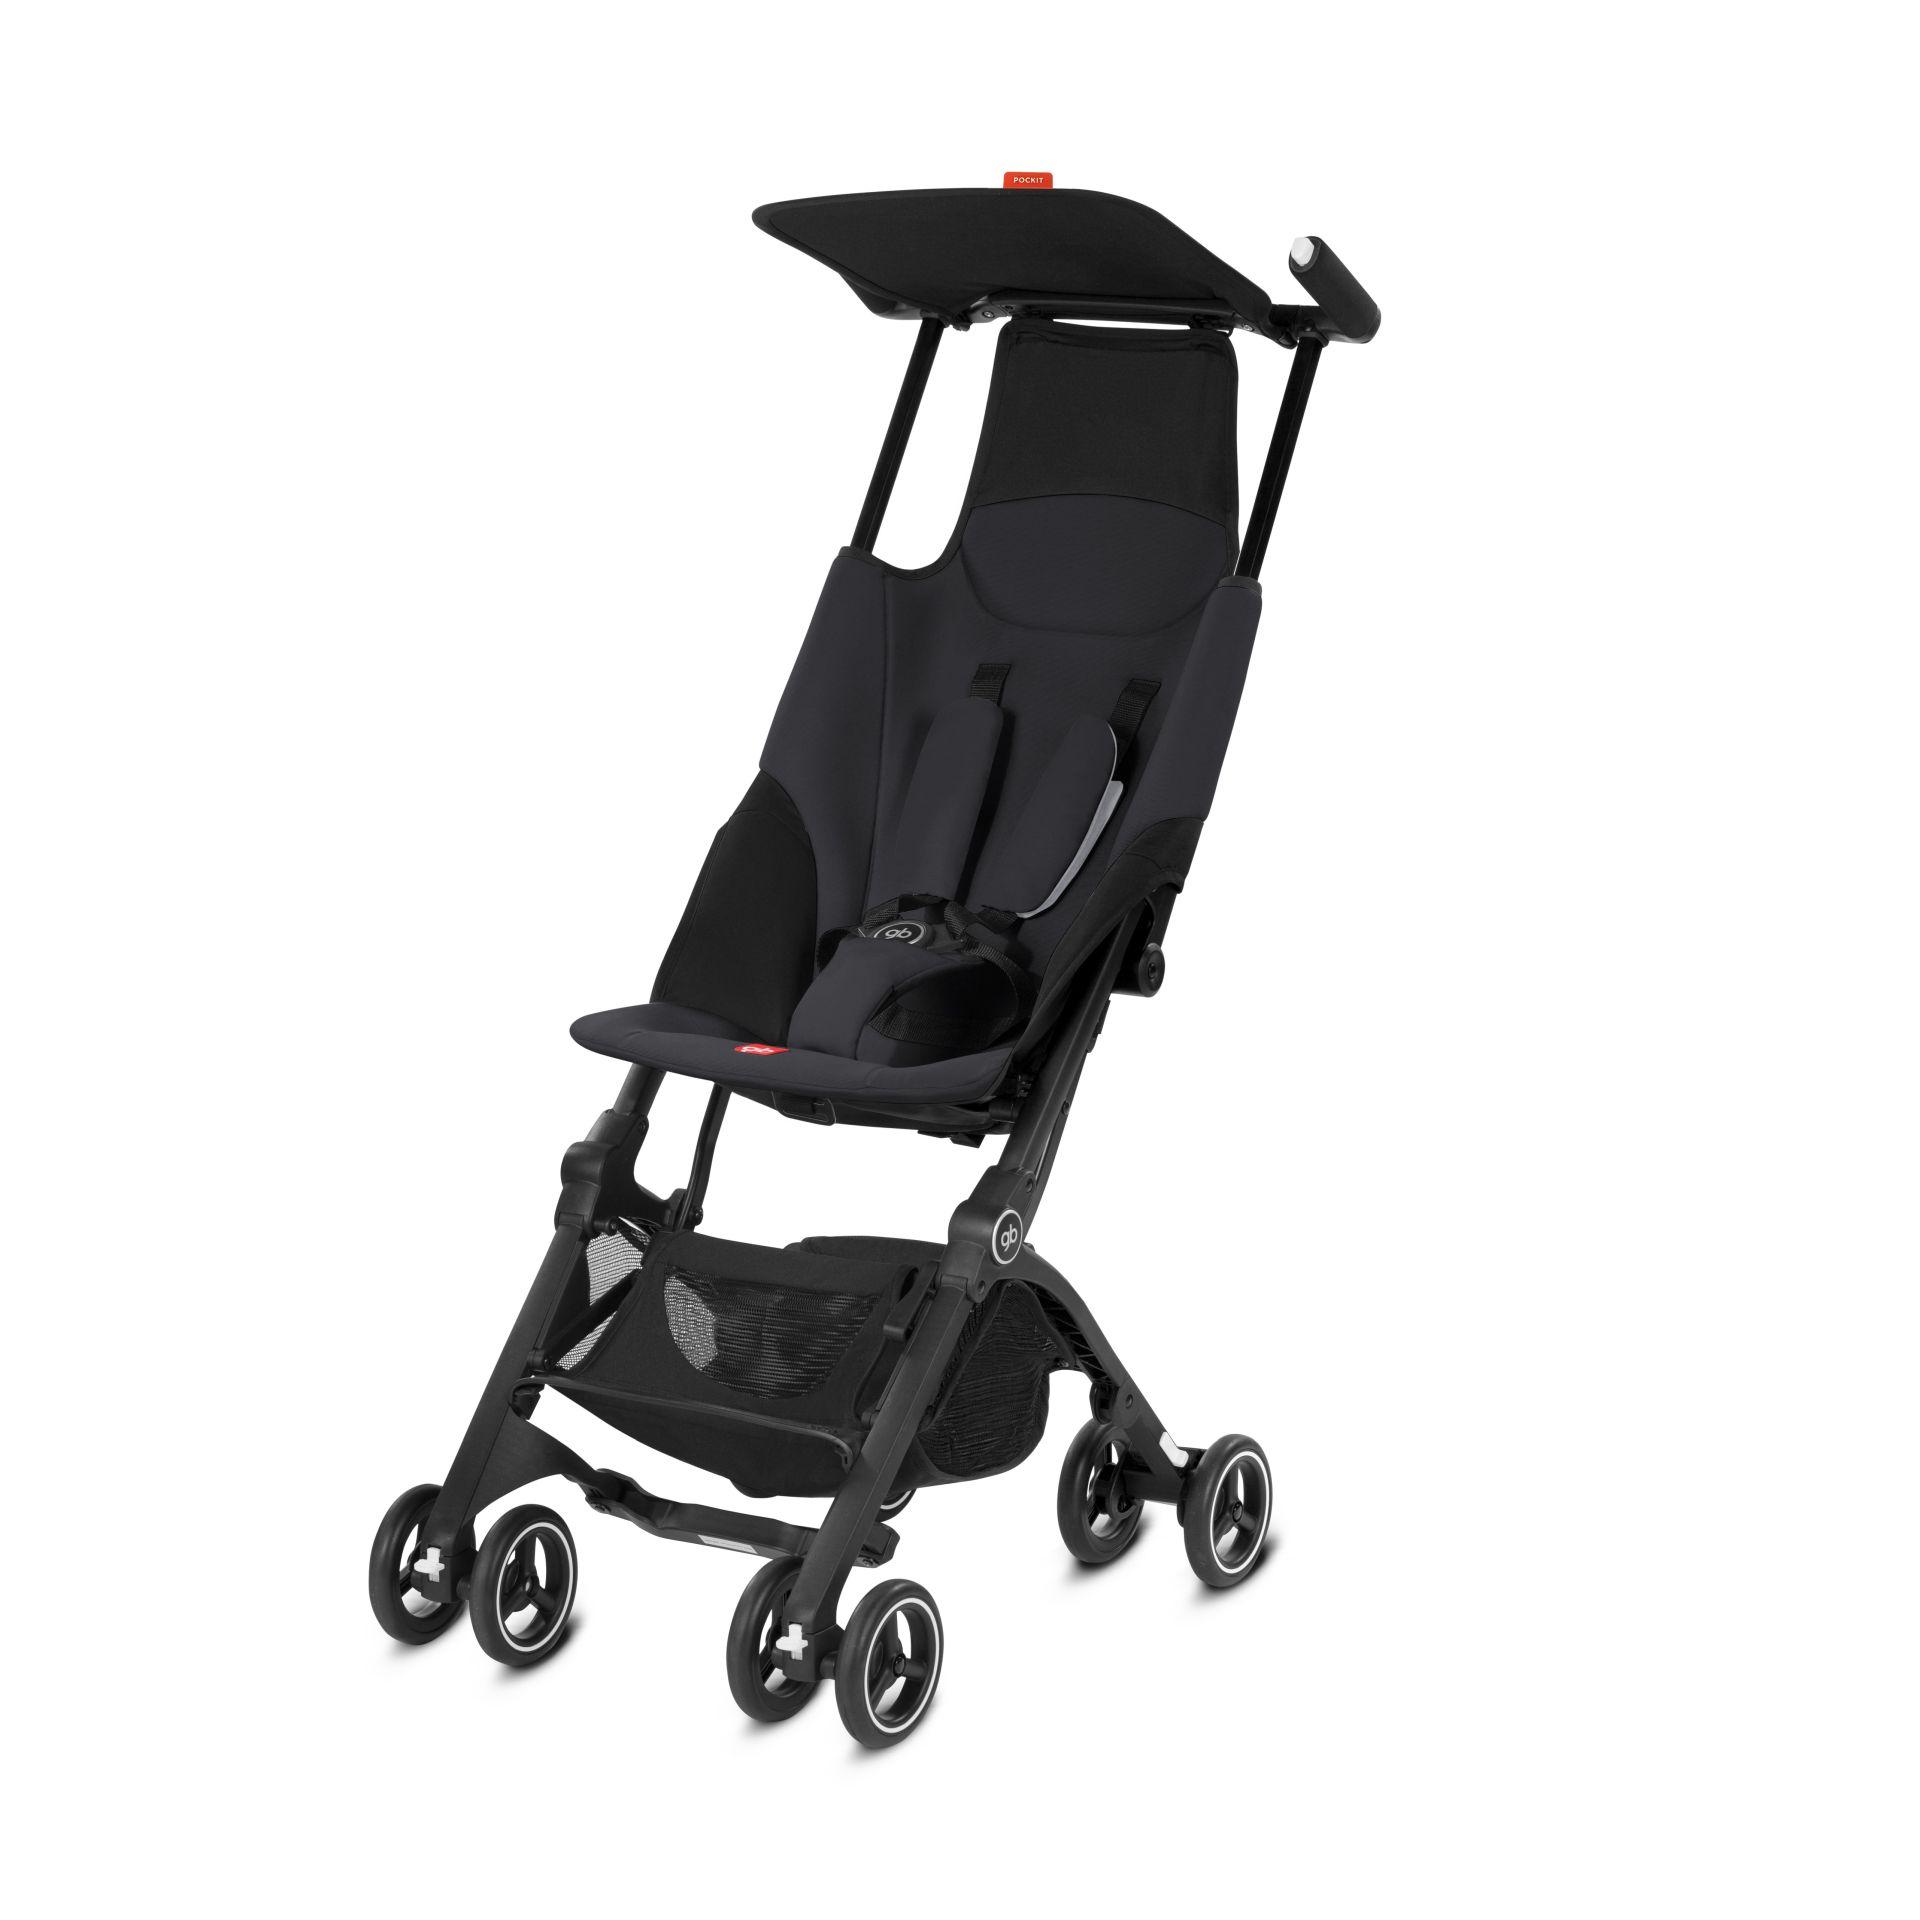 gb by cybex buggy pockit buy at kidsroom strollers. Black Bedroom Furniture Sets. Home Design Ideas